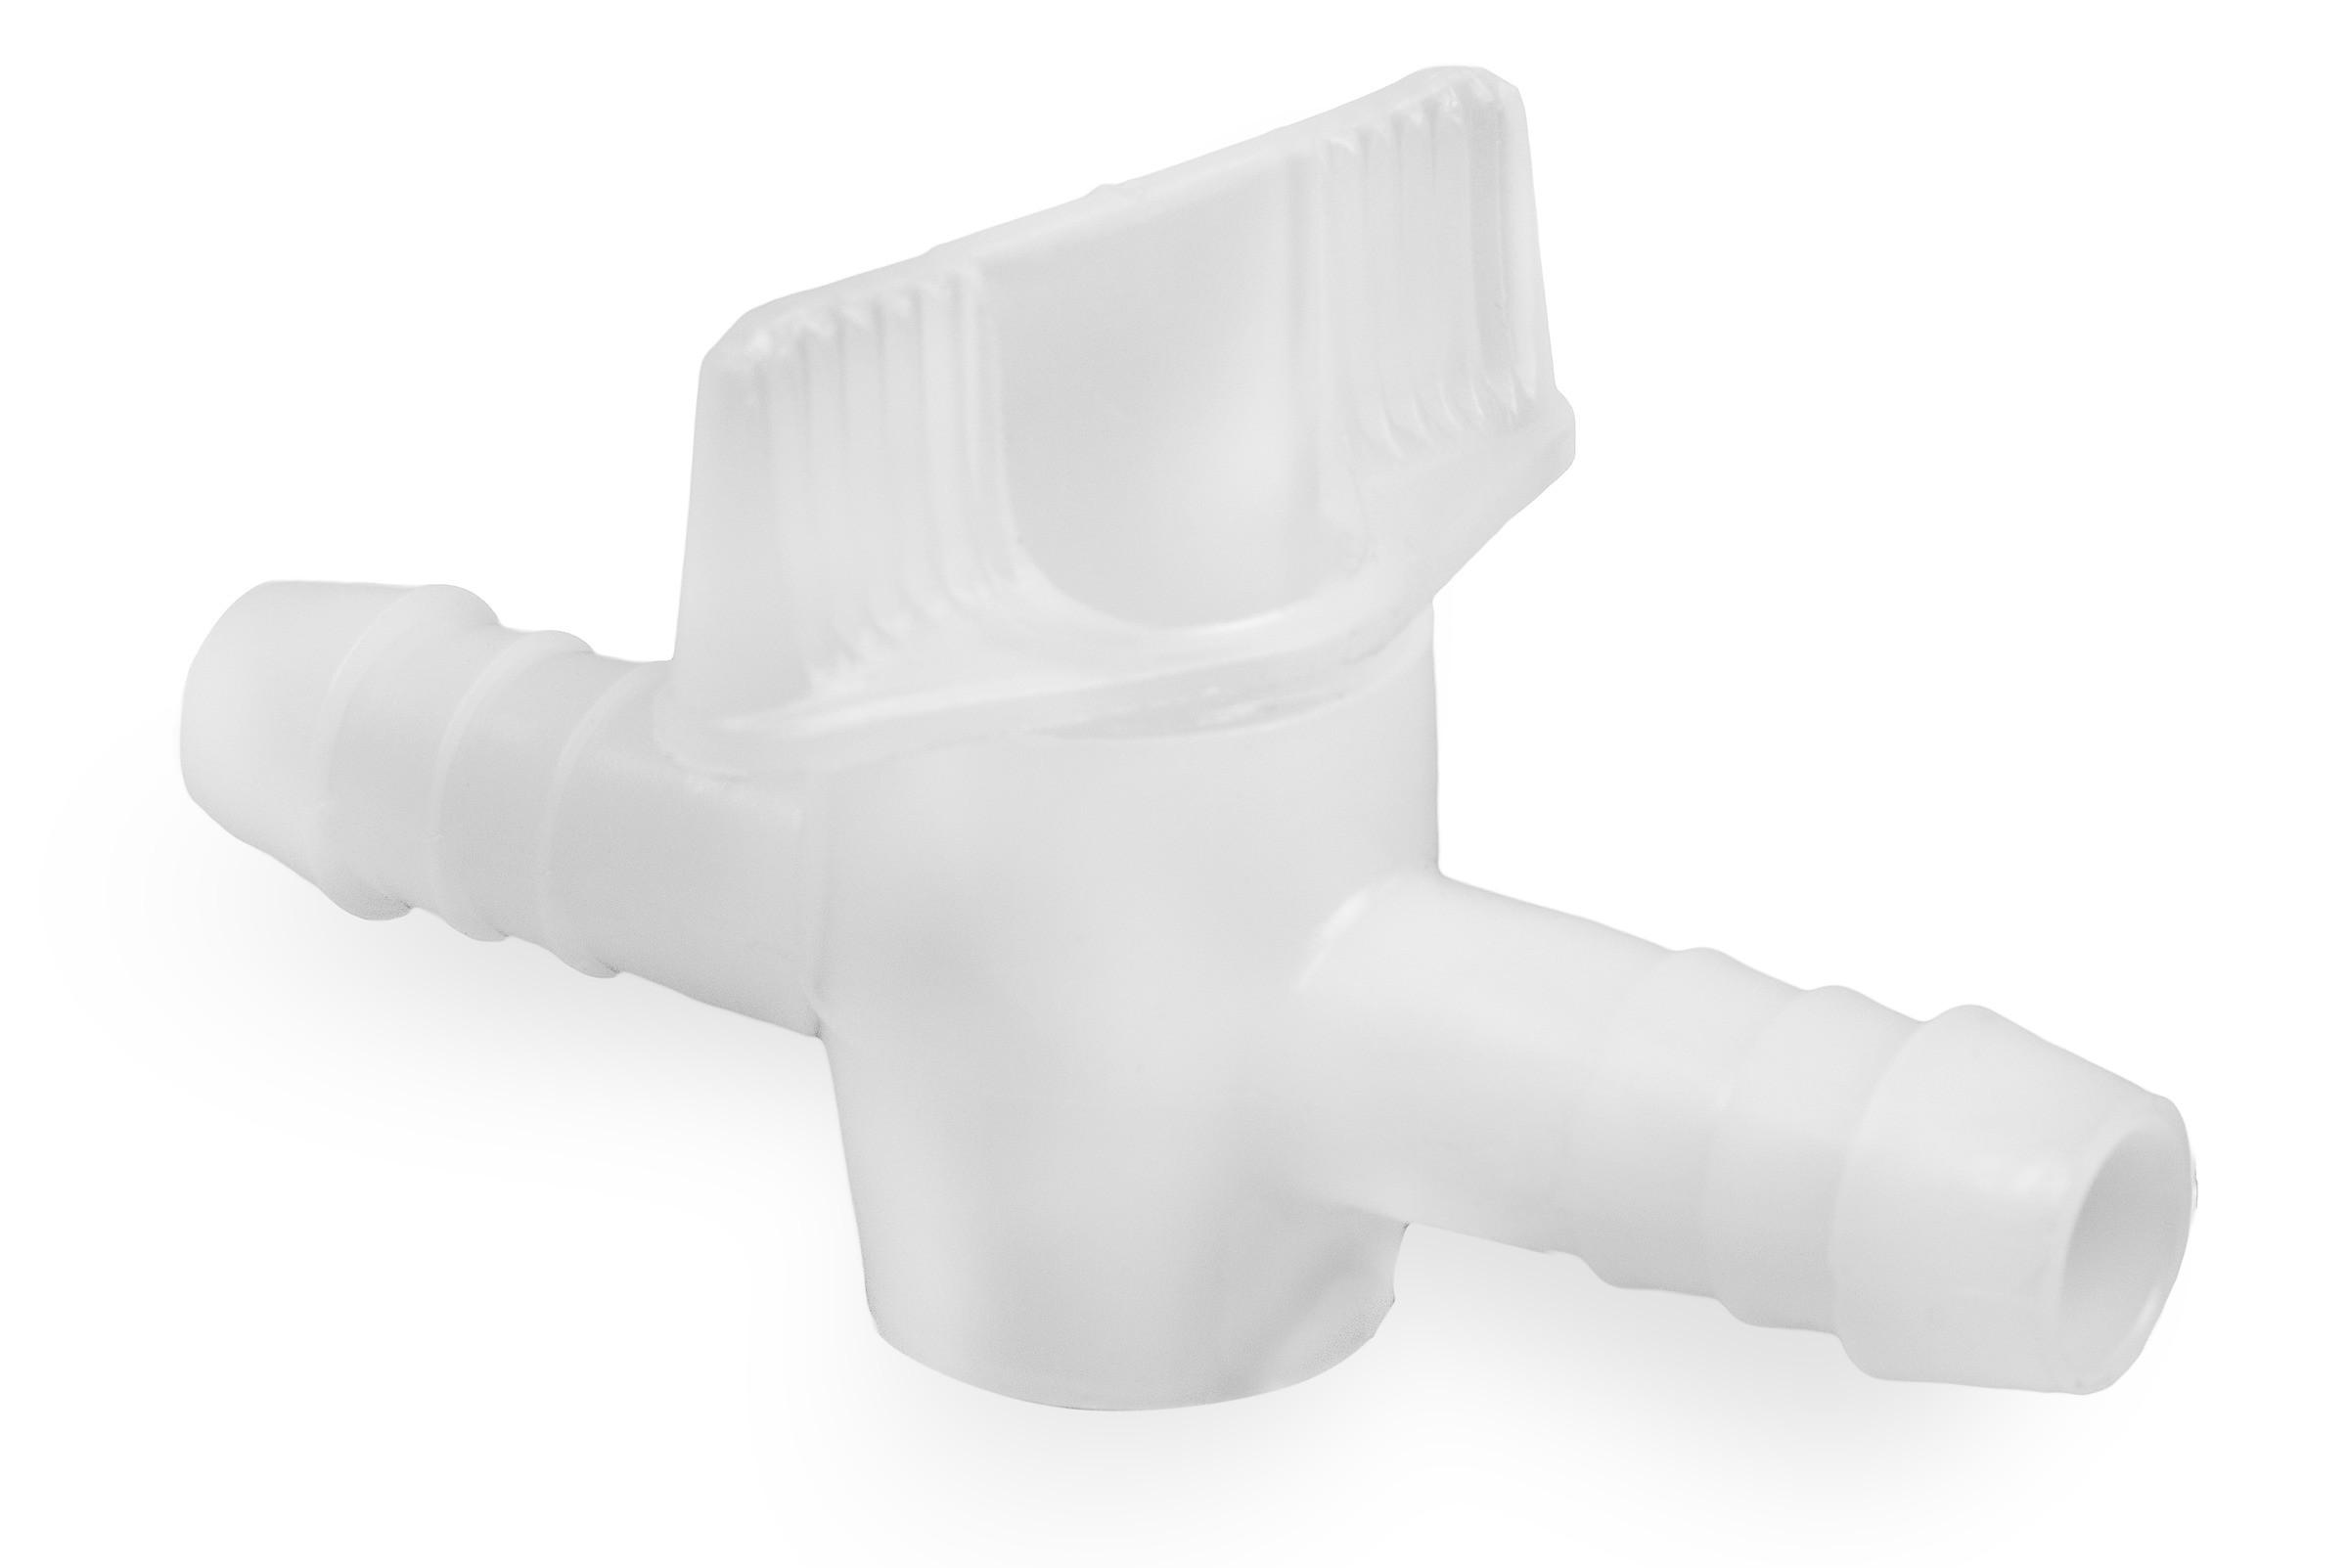 SP Bel-Art 2-Piece Stopcock for ½ in. Tubing; Polyethylene